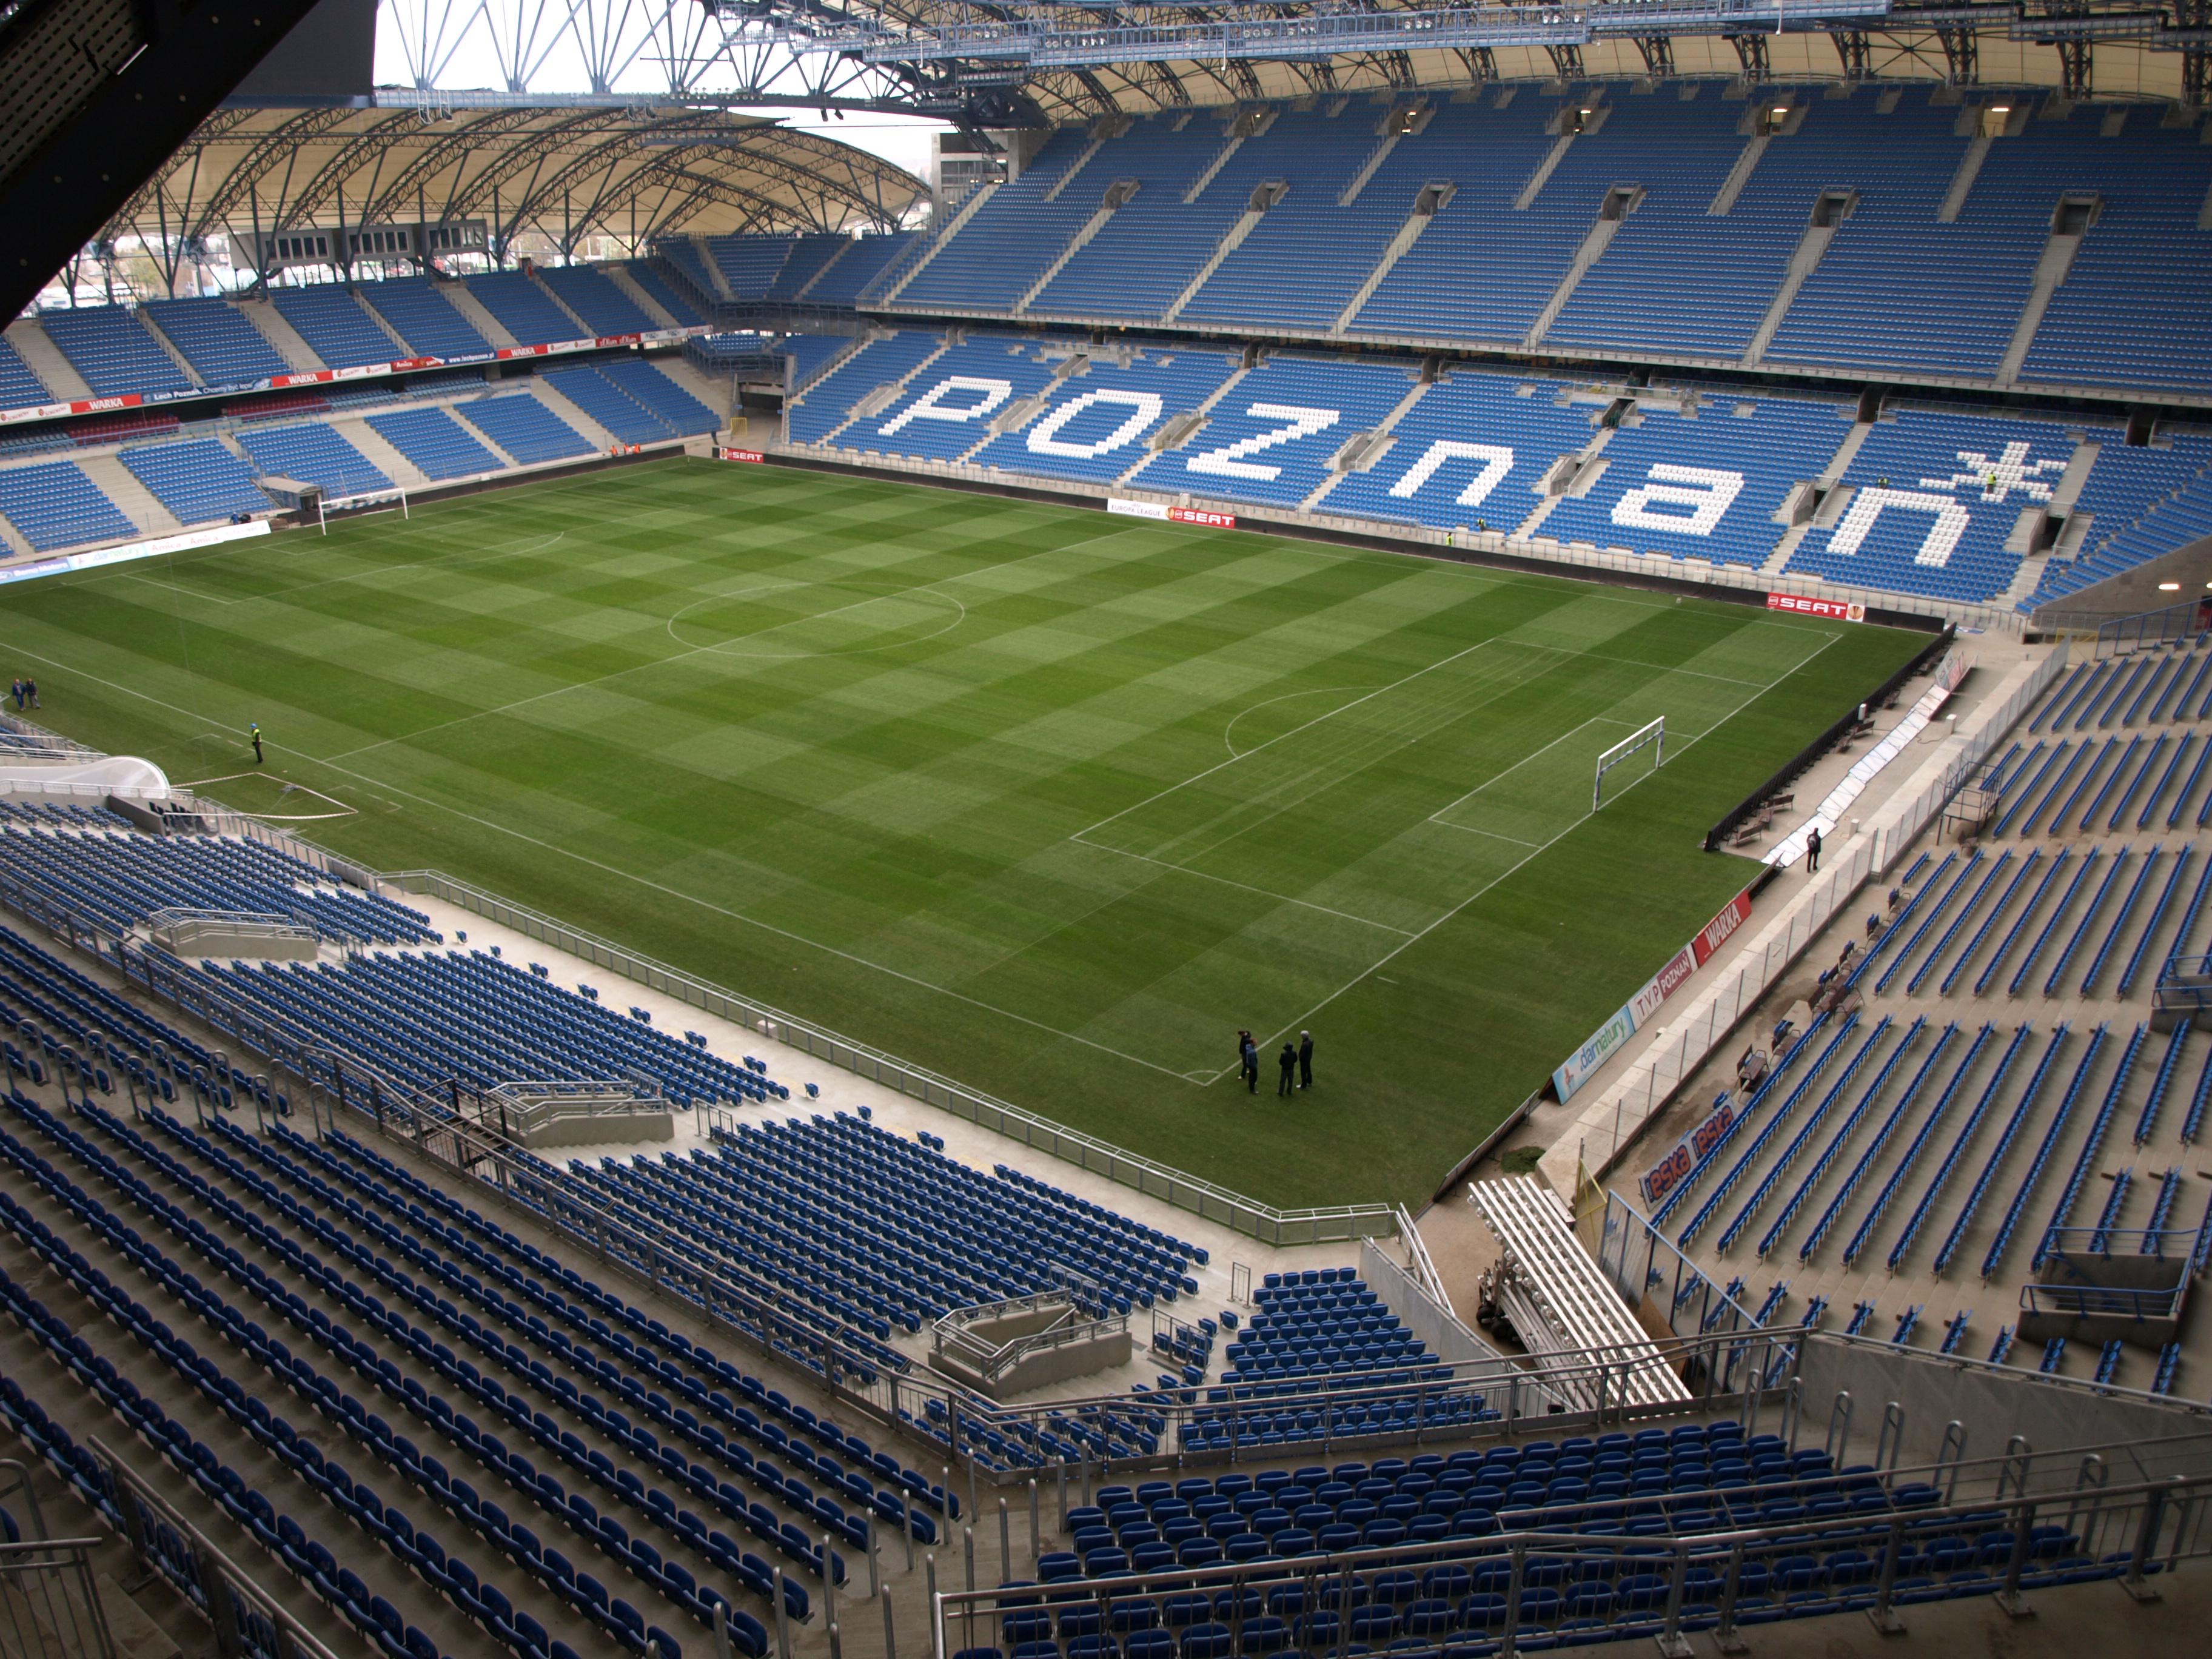 https://upload.wikimedia.org/wikipedia/commons/4/45/Stadion_Lecha_Poznan._2010-11-03_%284%29.JPG